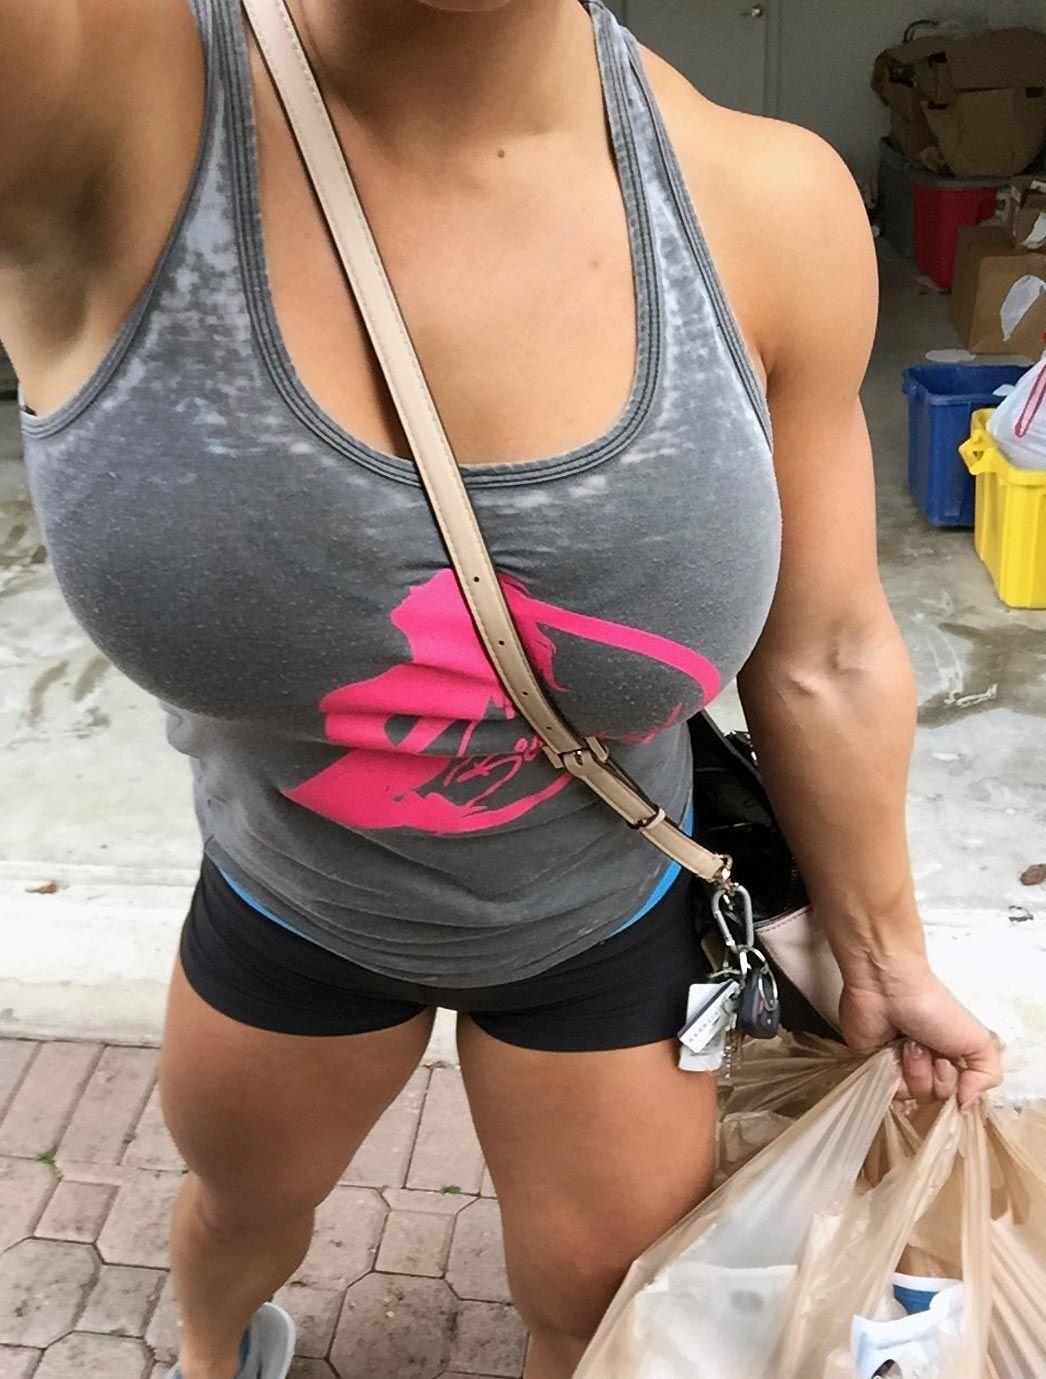 Celeste Bonin Nude Leaked The Fappening & Sexy 0215